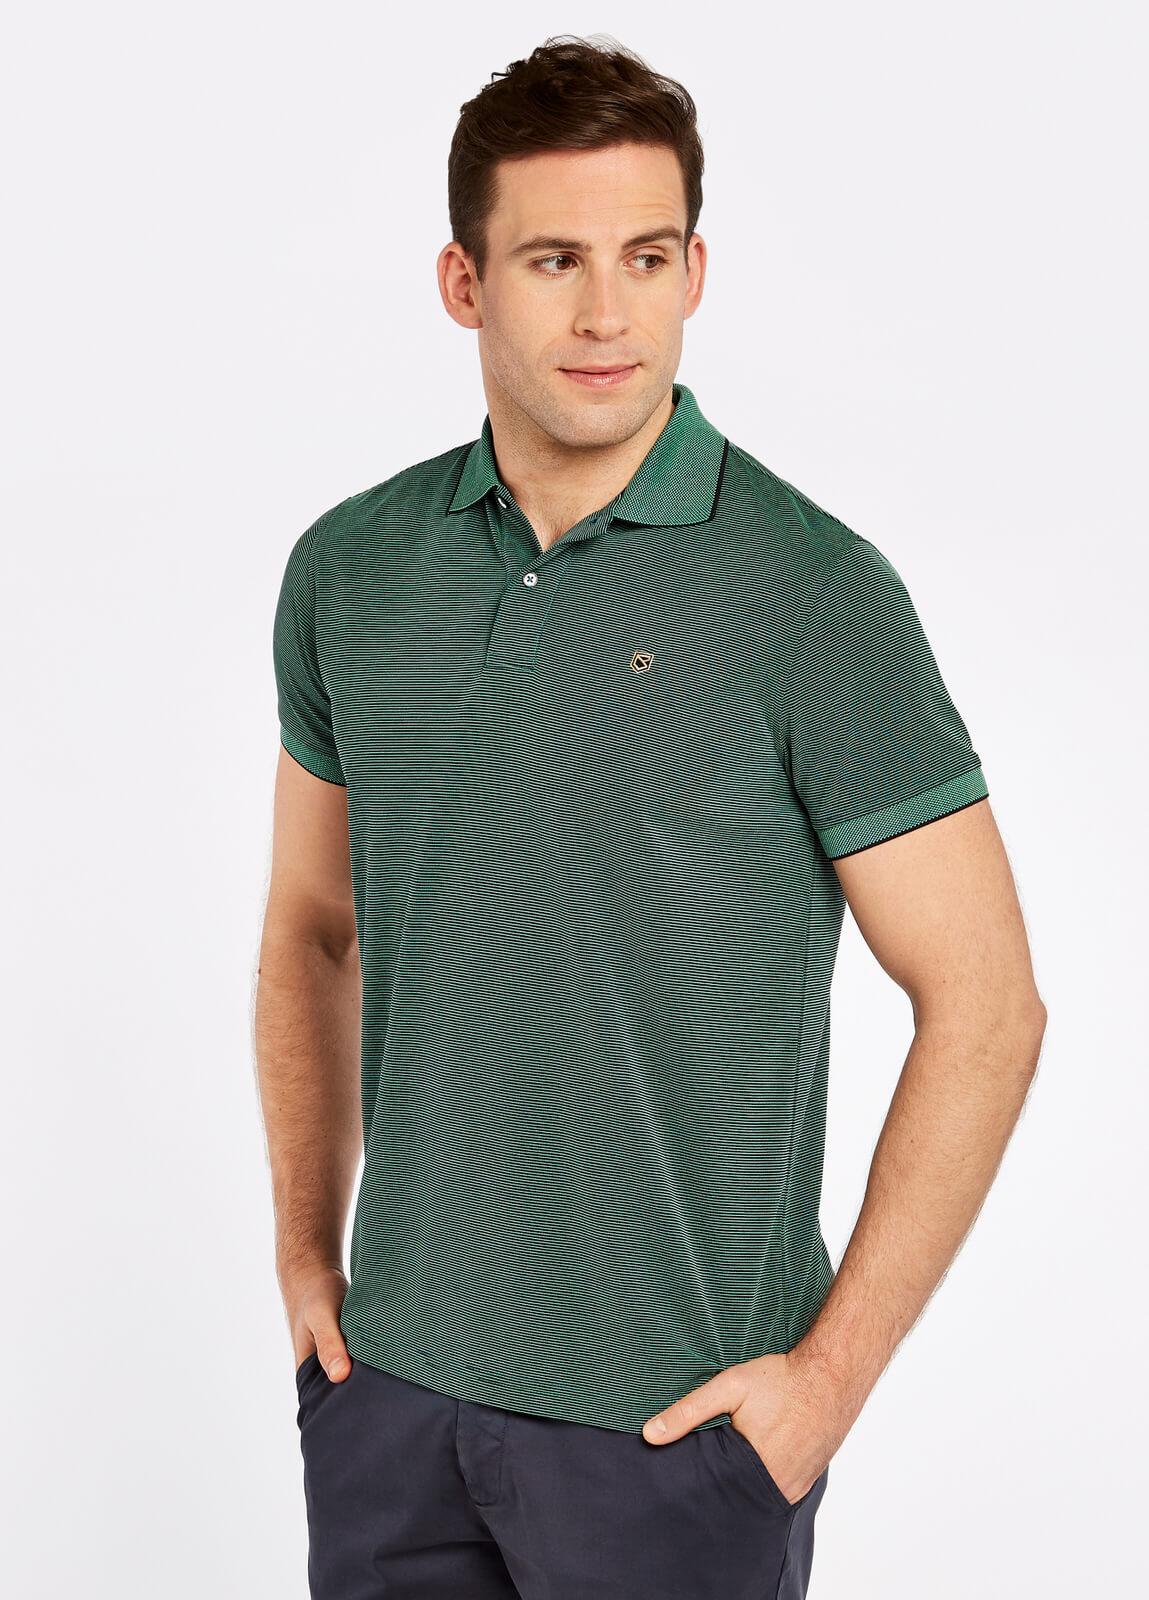 Charlemount Polo Shirt - Kelly Green